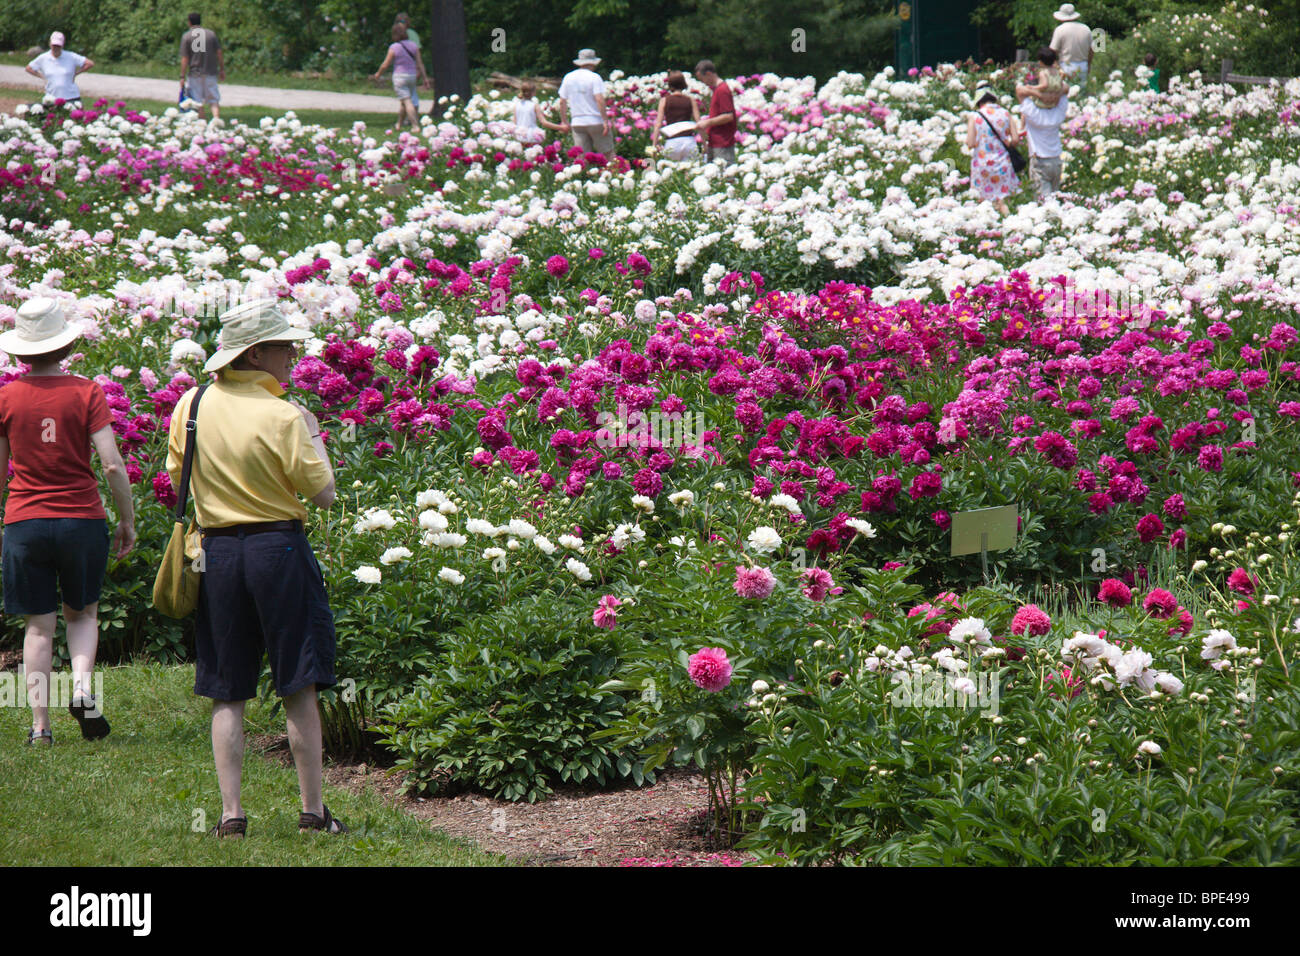 Peonies In Bloom At The Matthaie Botanical Garden And Nichols Arboretum,  University Of Michigan, Ann Arbor, Michigan, USA